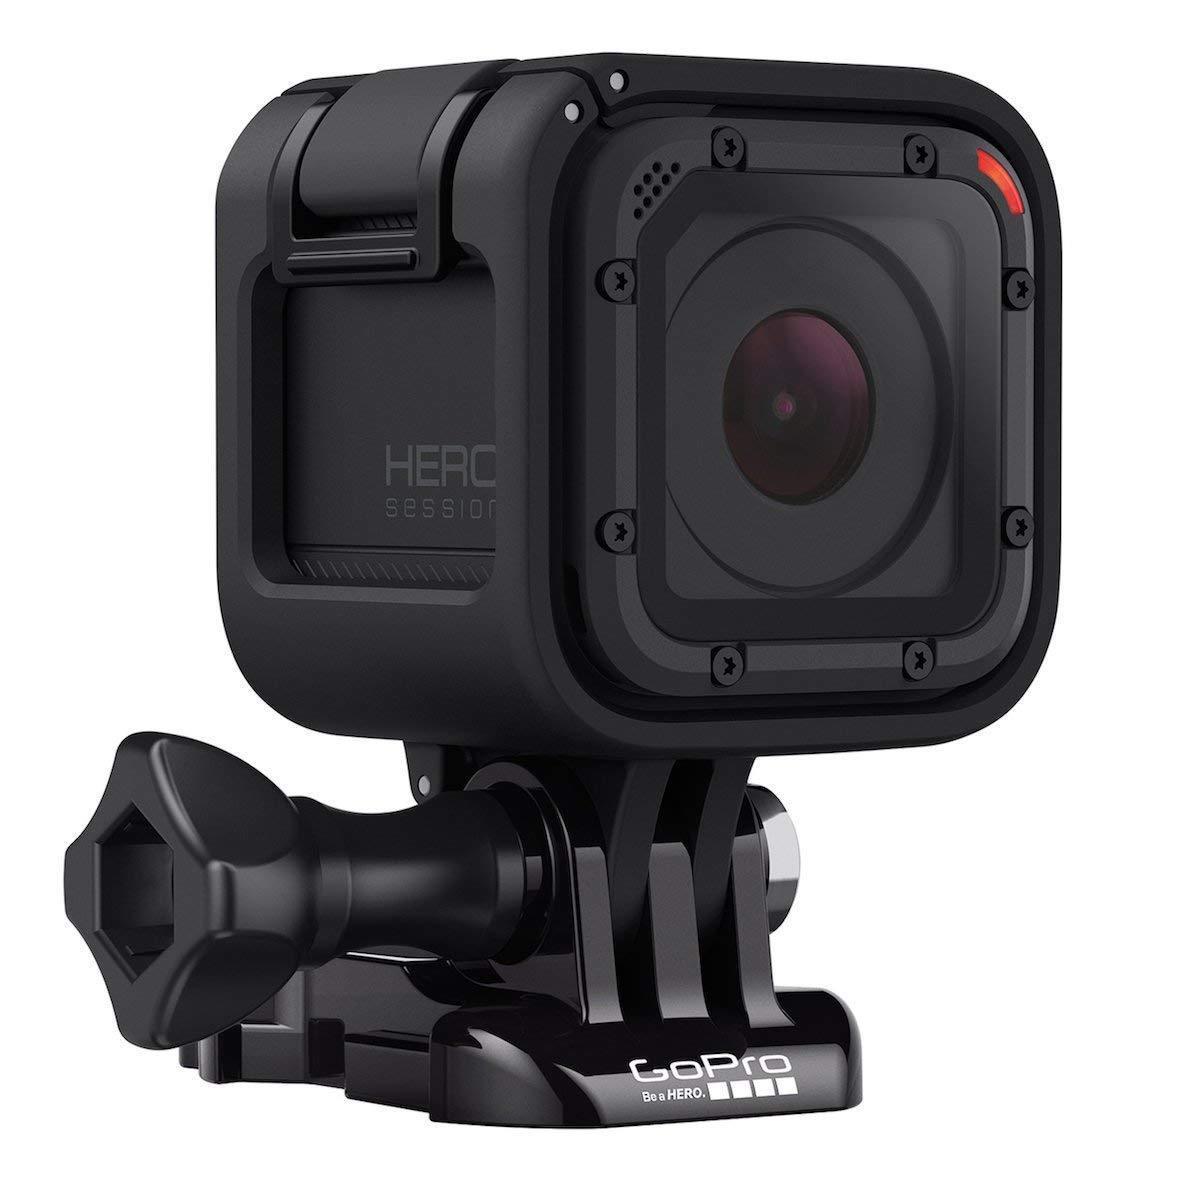 GoPro HERO Session Action-Kamera - Zertifiziert B-Ware [eBay GoPro]